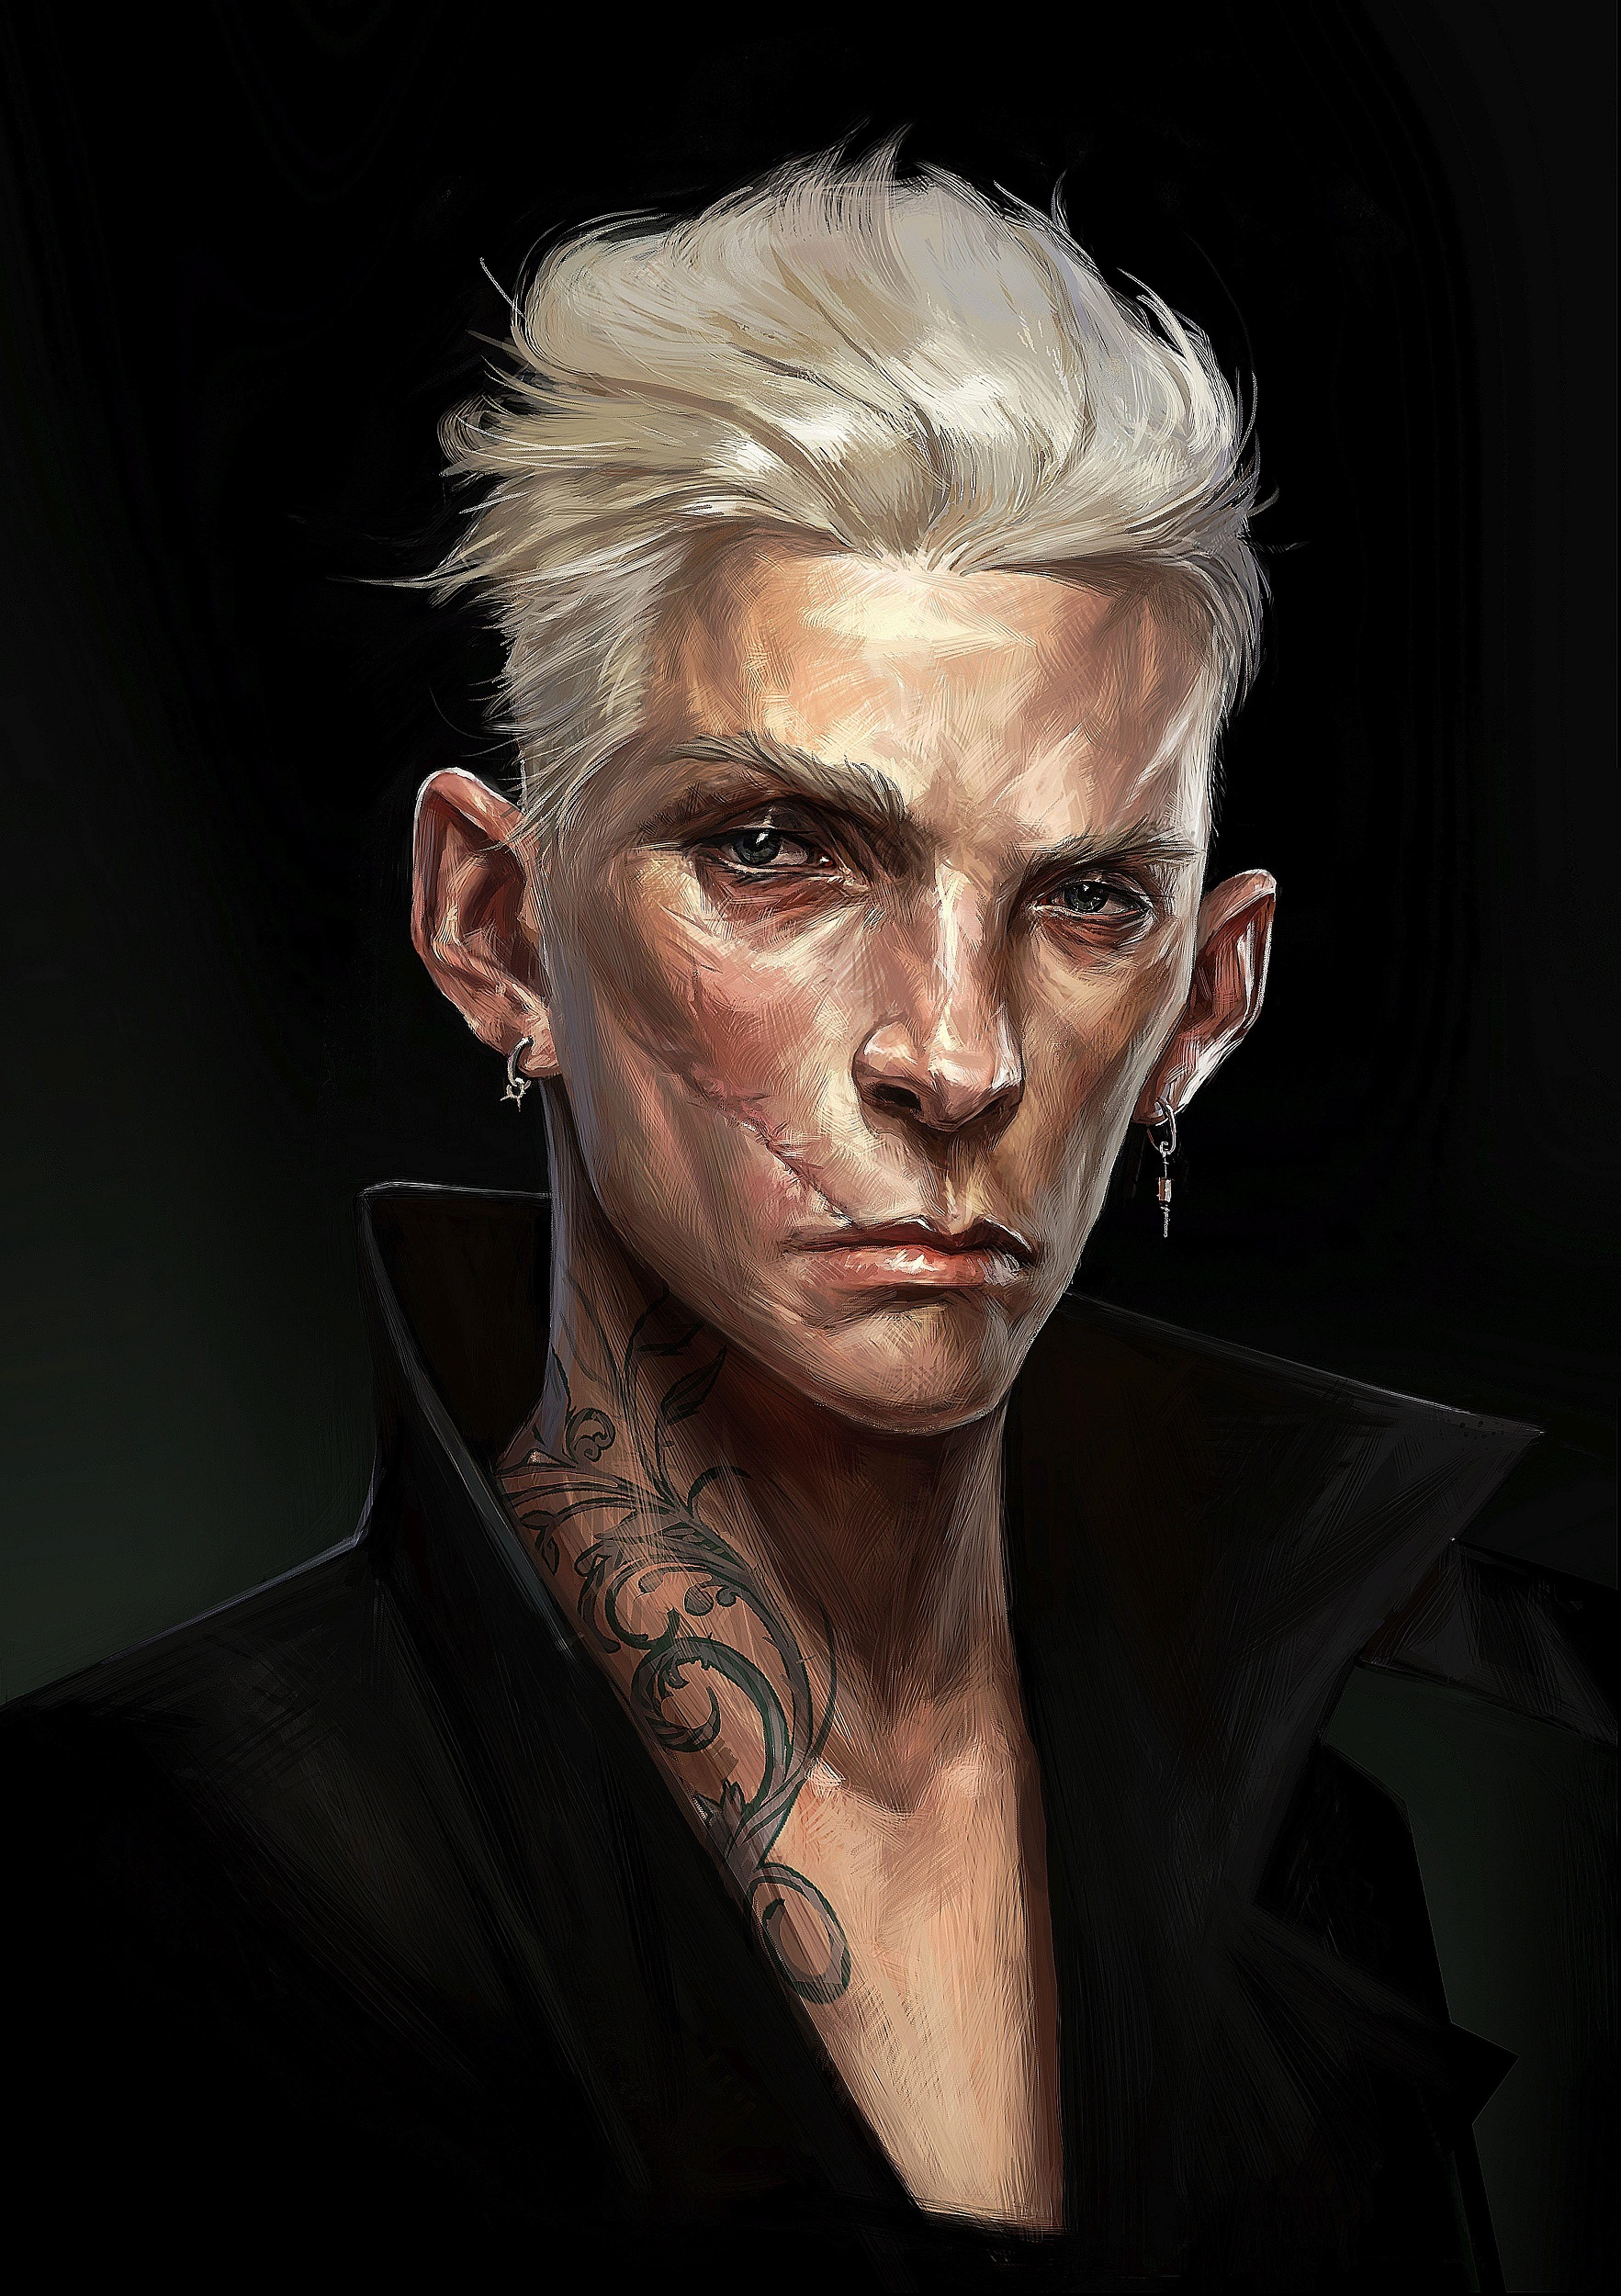 new dishonored 2 screenshots and artwork released  u2013 capsule computers